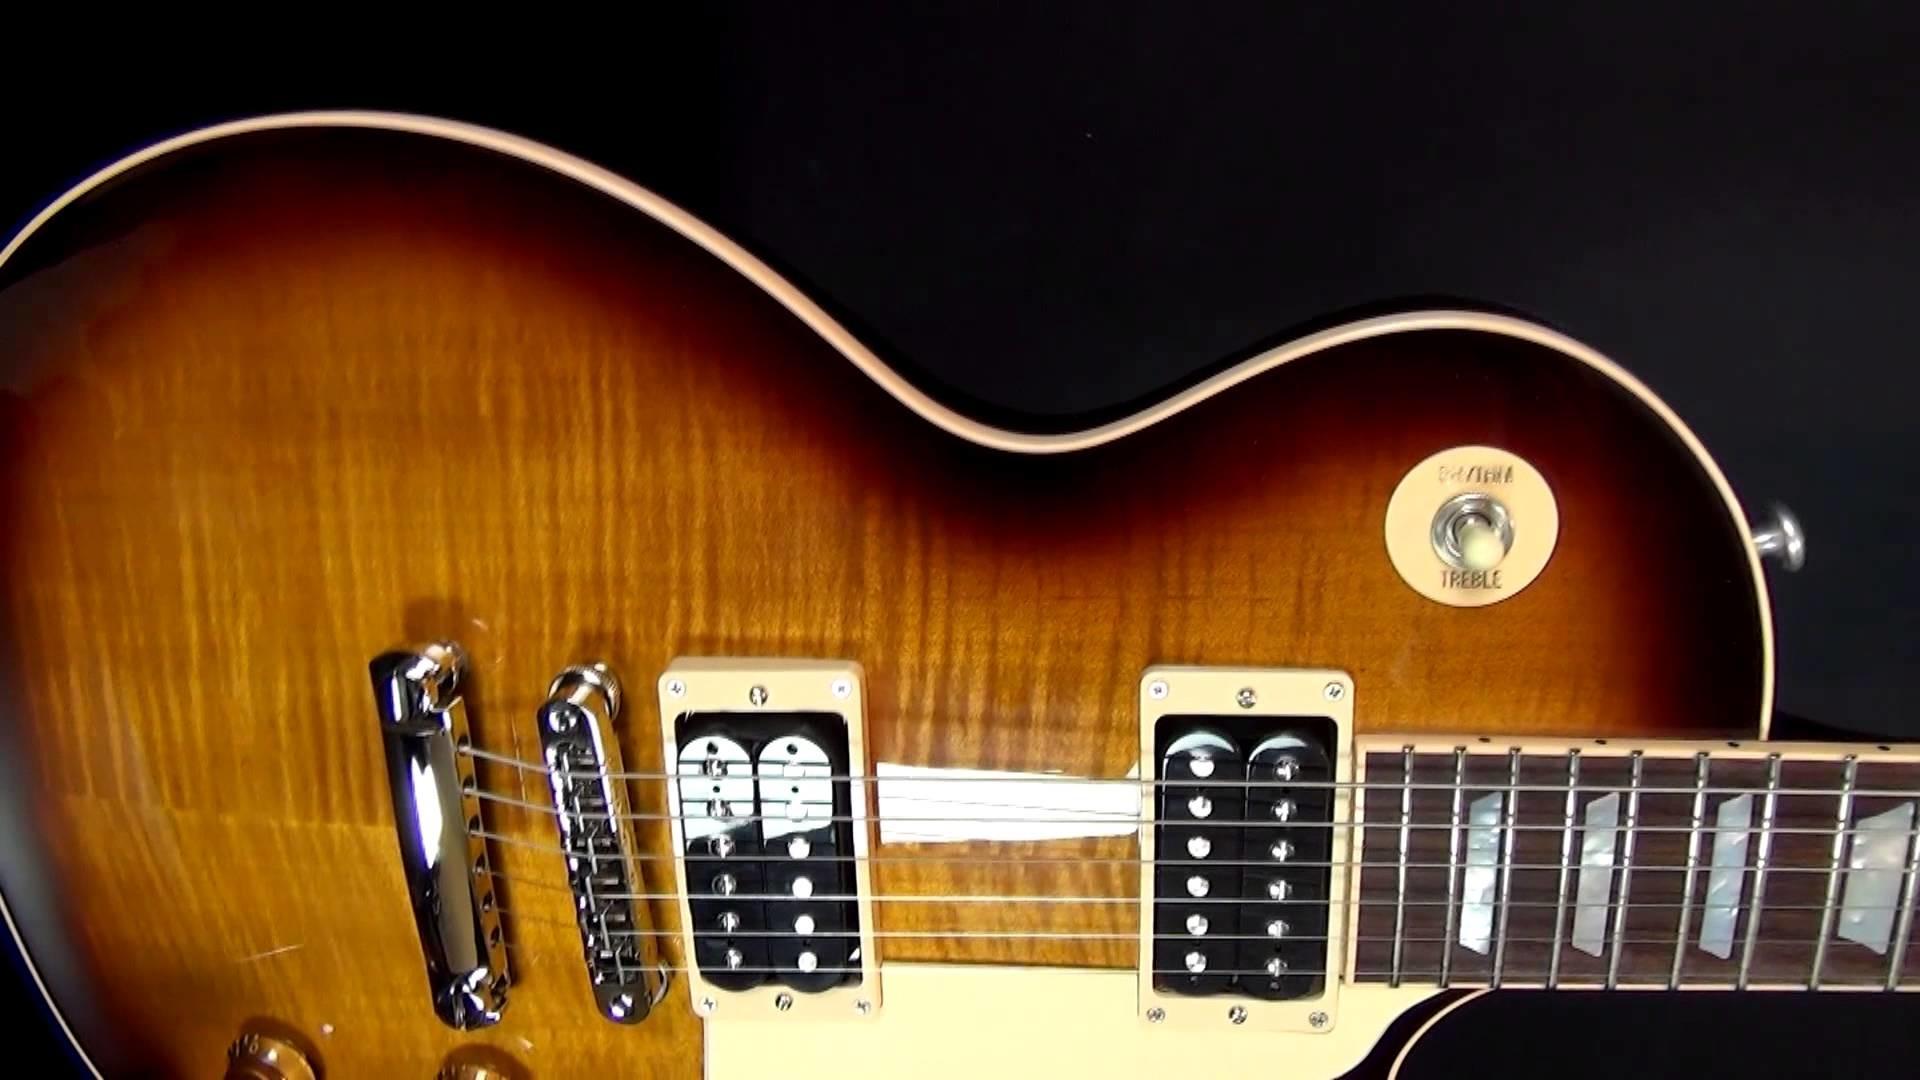 1920x1080 Guitar Wallpaper Gibson Les Paul Supreme